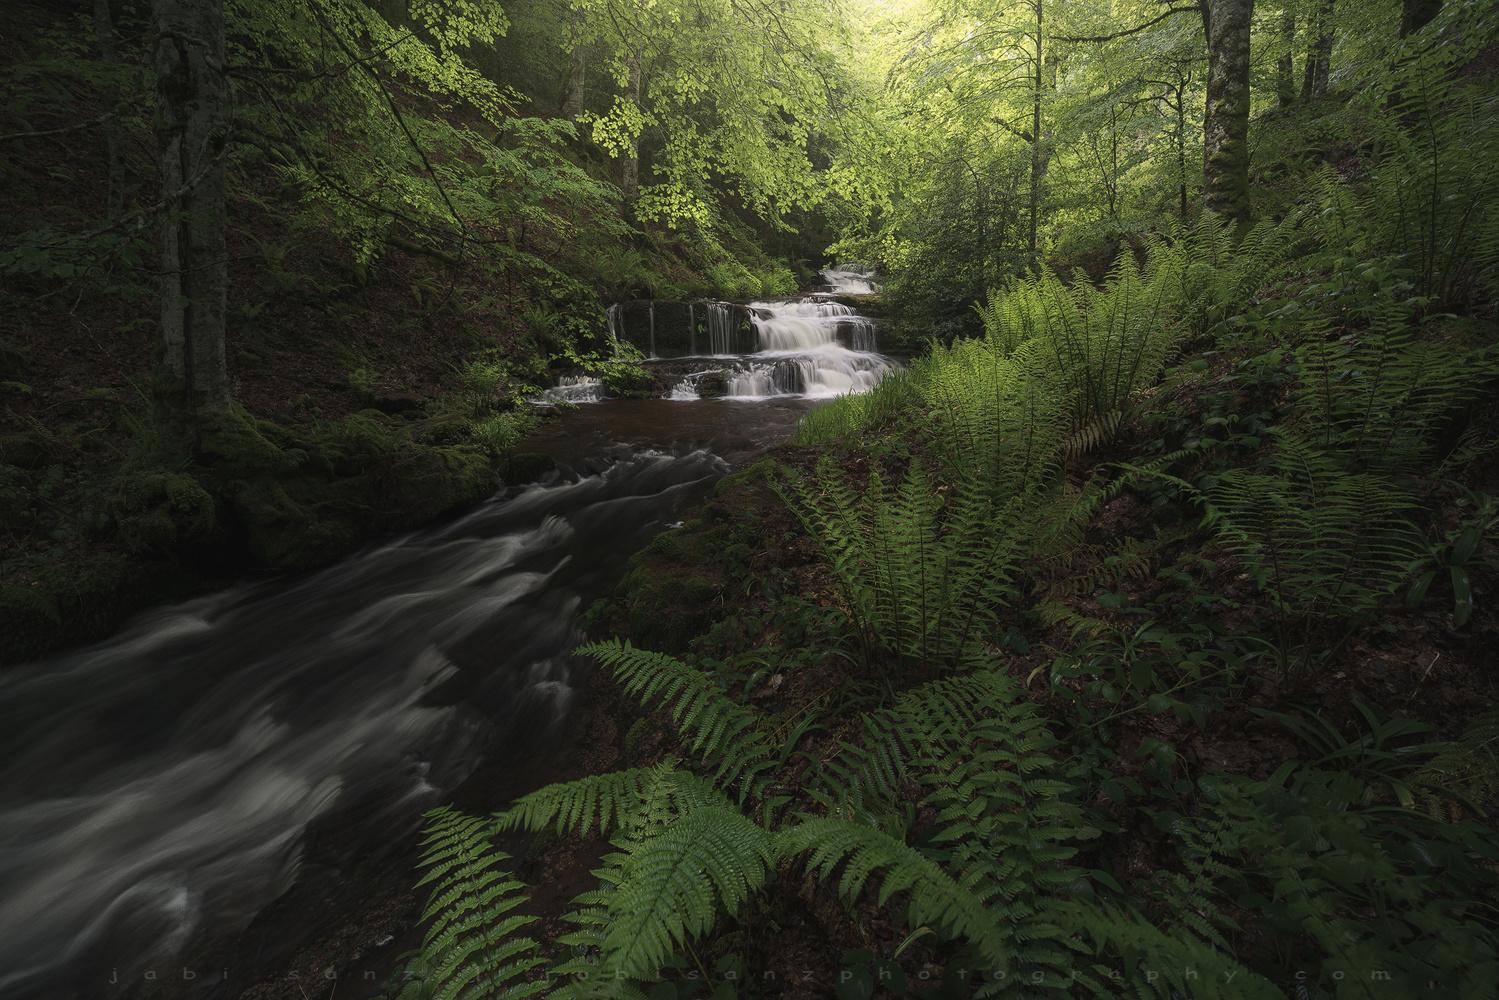 Rain forest by jabi sanz